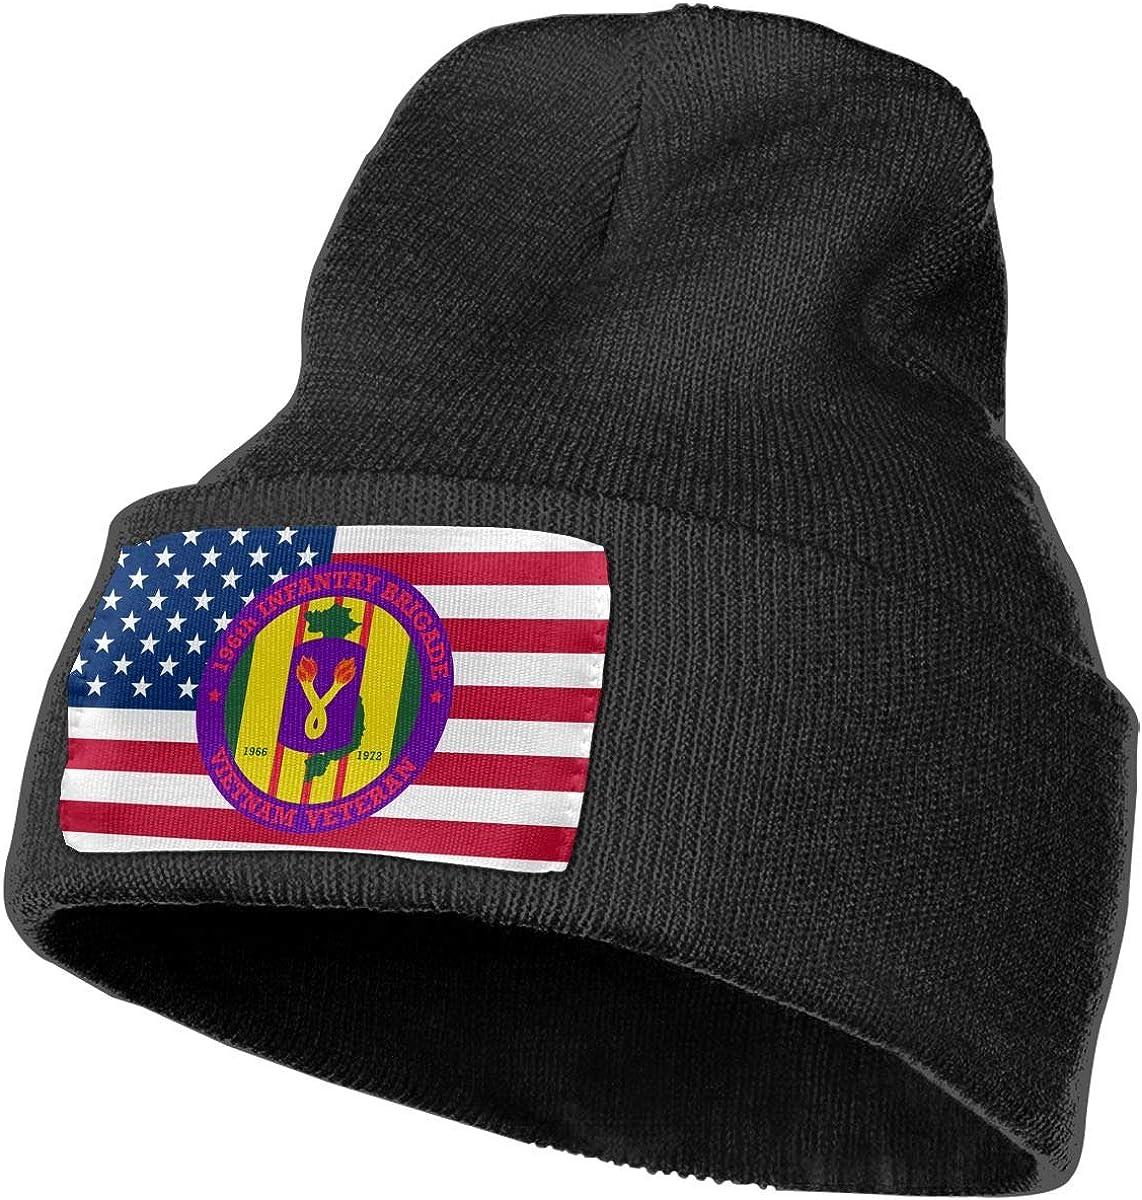 196th Light Infantry Brigade Vietnam Veteran Men/&Women Warm Winter Knit Plain Beanie Hat Skull Cap Acrylic Knit Cuff Hat